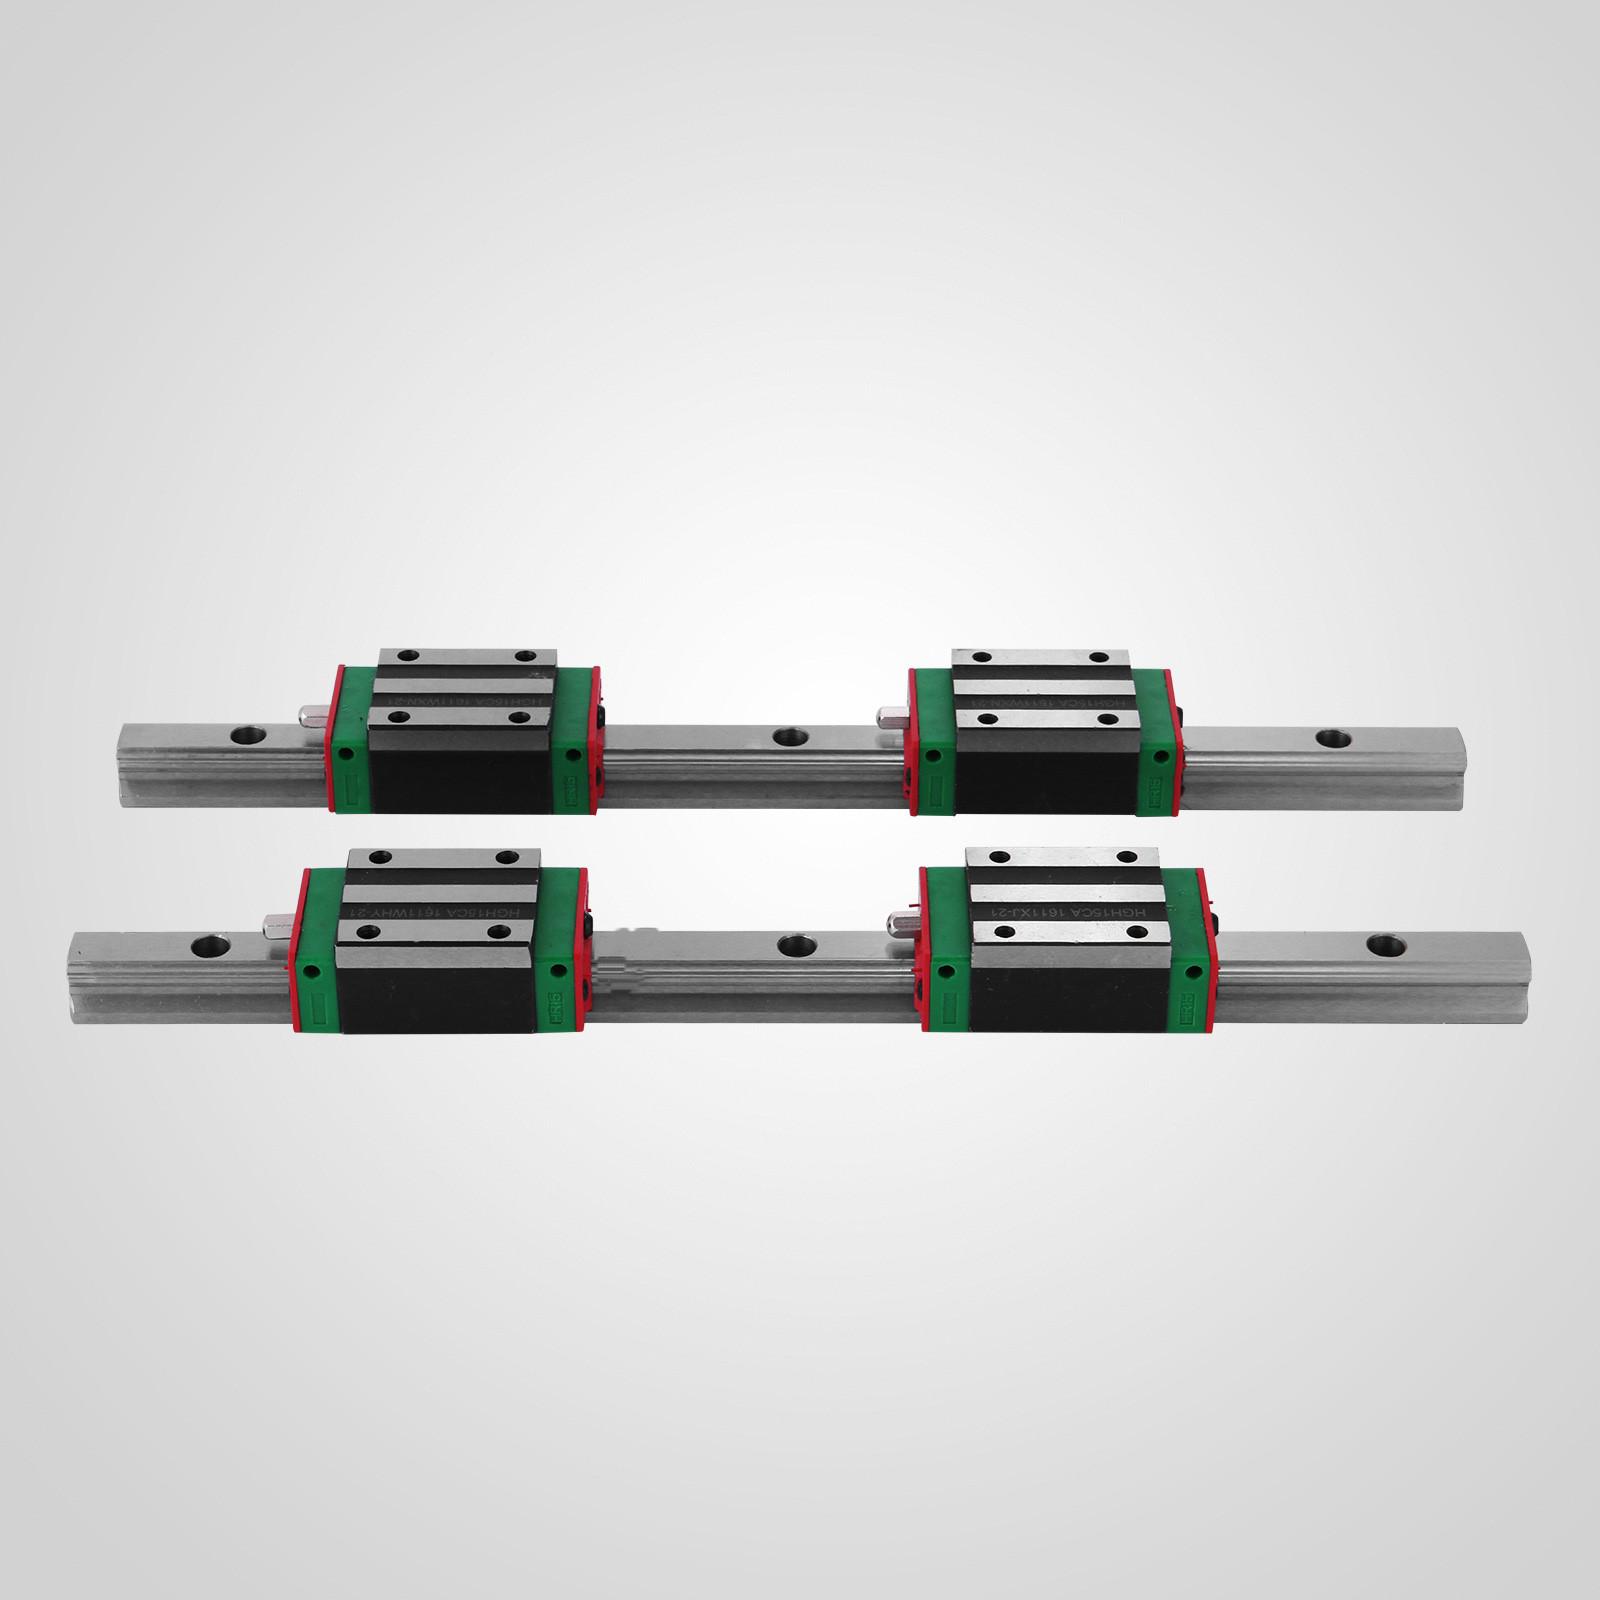 CNC Set 20-1000mm 2x Linear Guideway Rail 4x Square type carriage bearing block